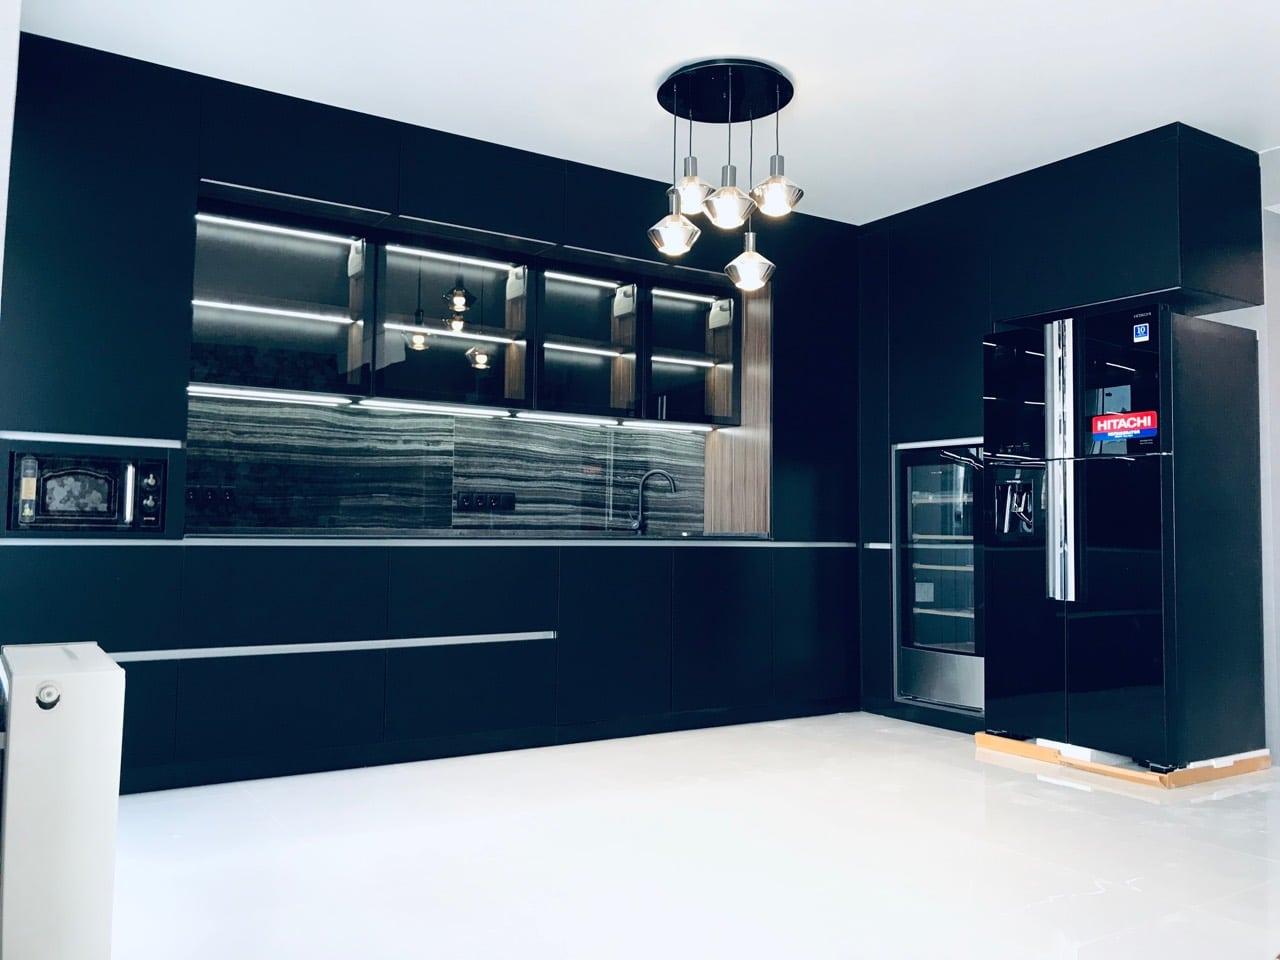 R-W660puc7GBK_interNEW Холодильник для кухни-студии, дизайн.